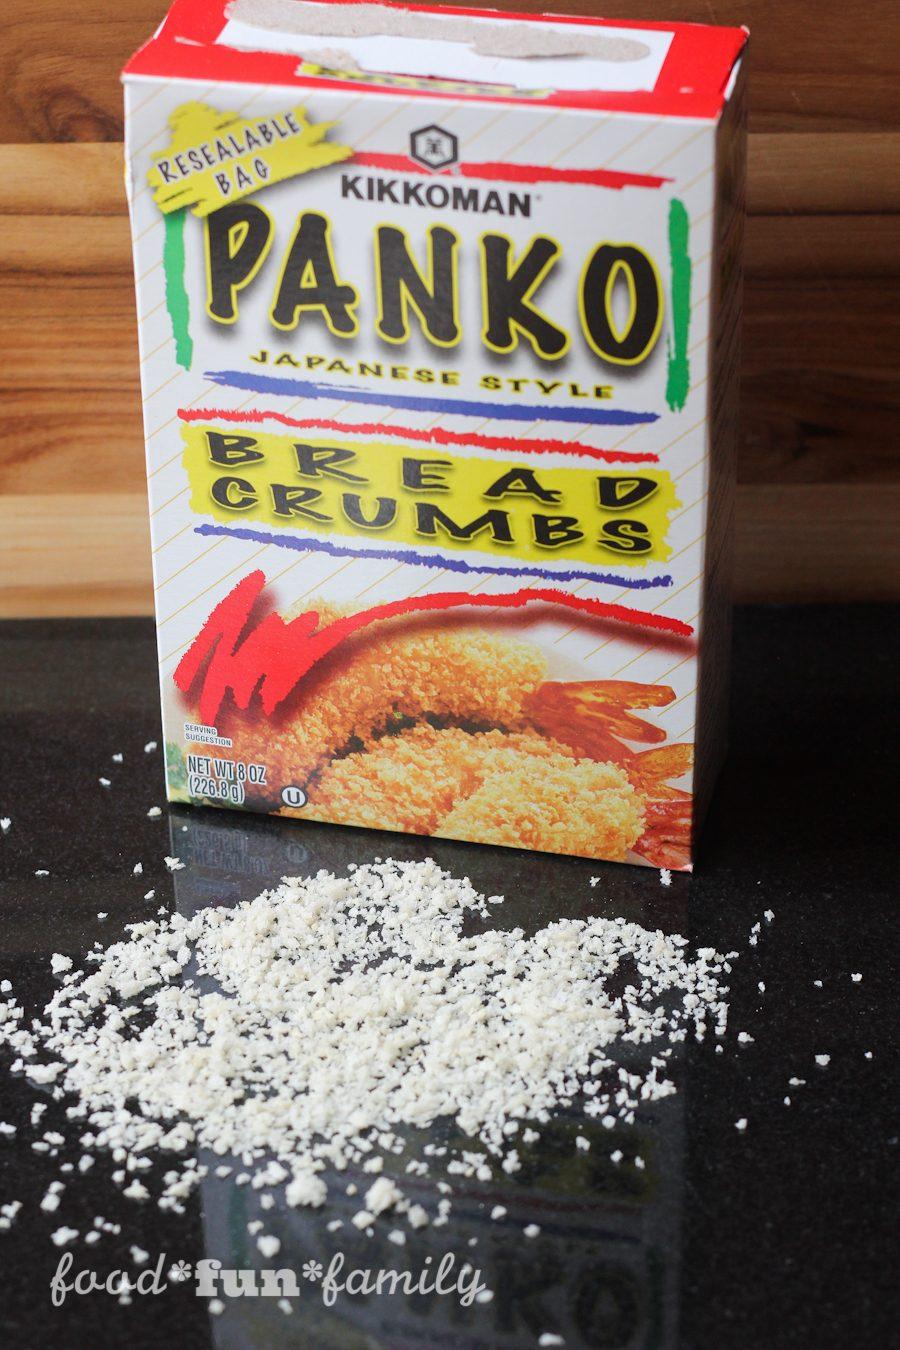 Baked Asparagus Fries with Kikkoman panko bread crumbs